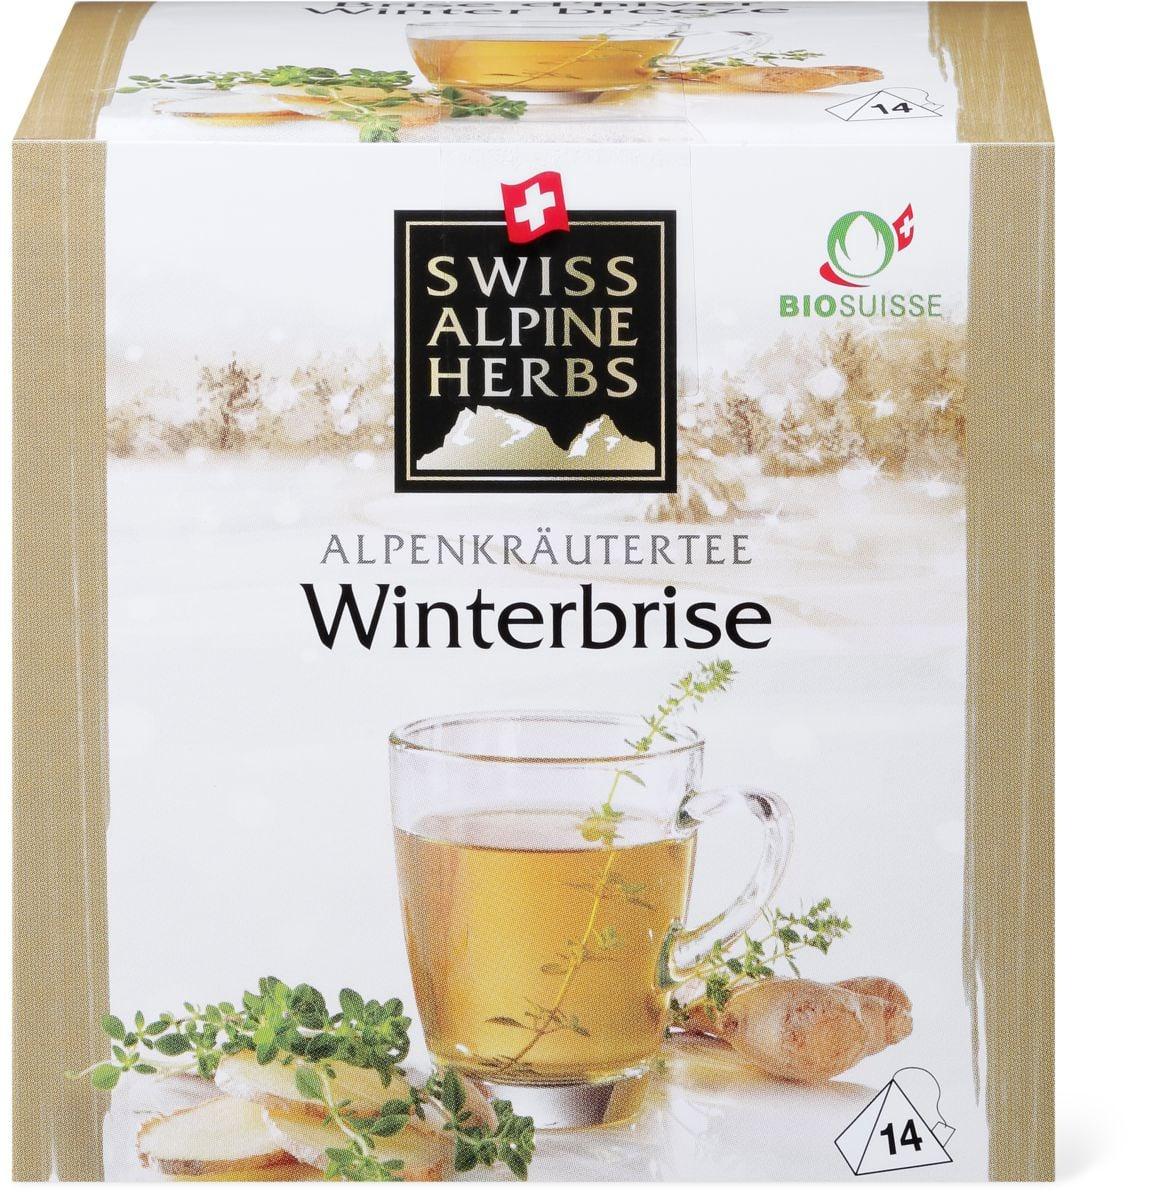 Bio Swiss Alpine Herbs Winterbrise